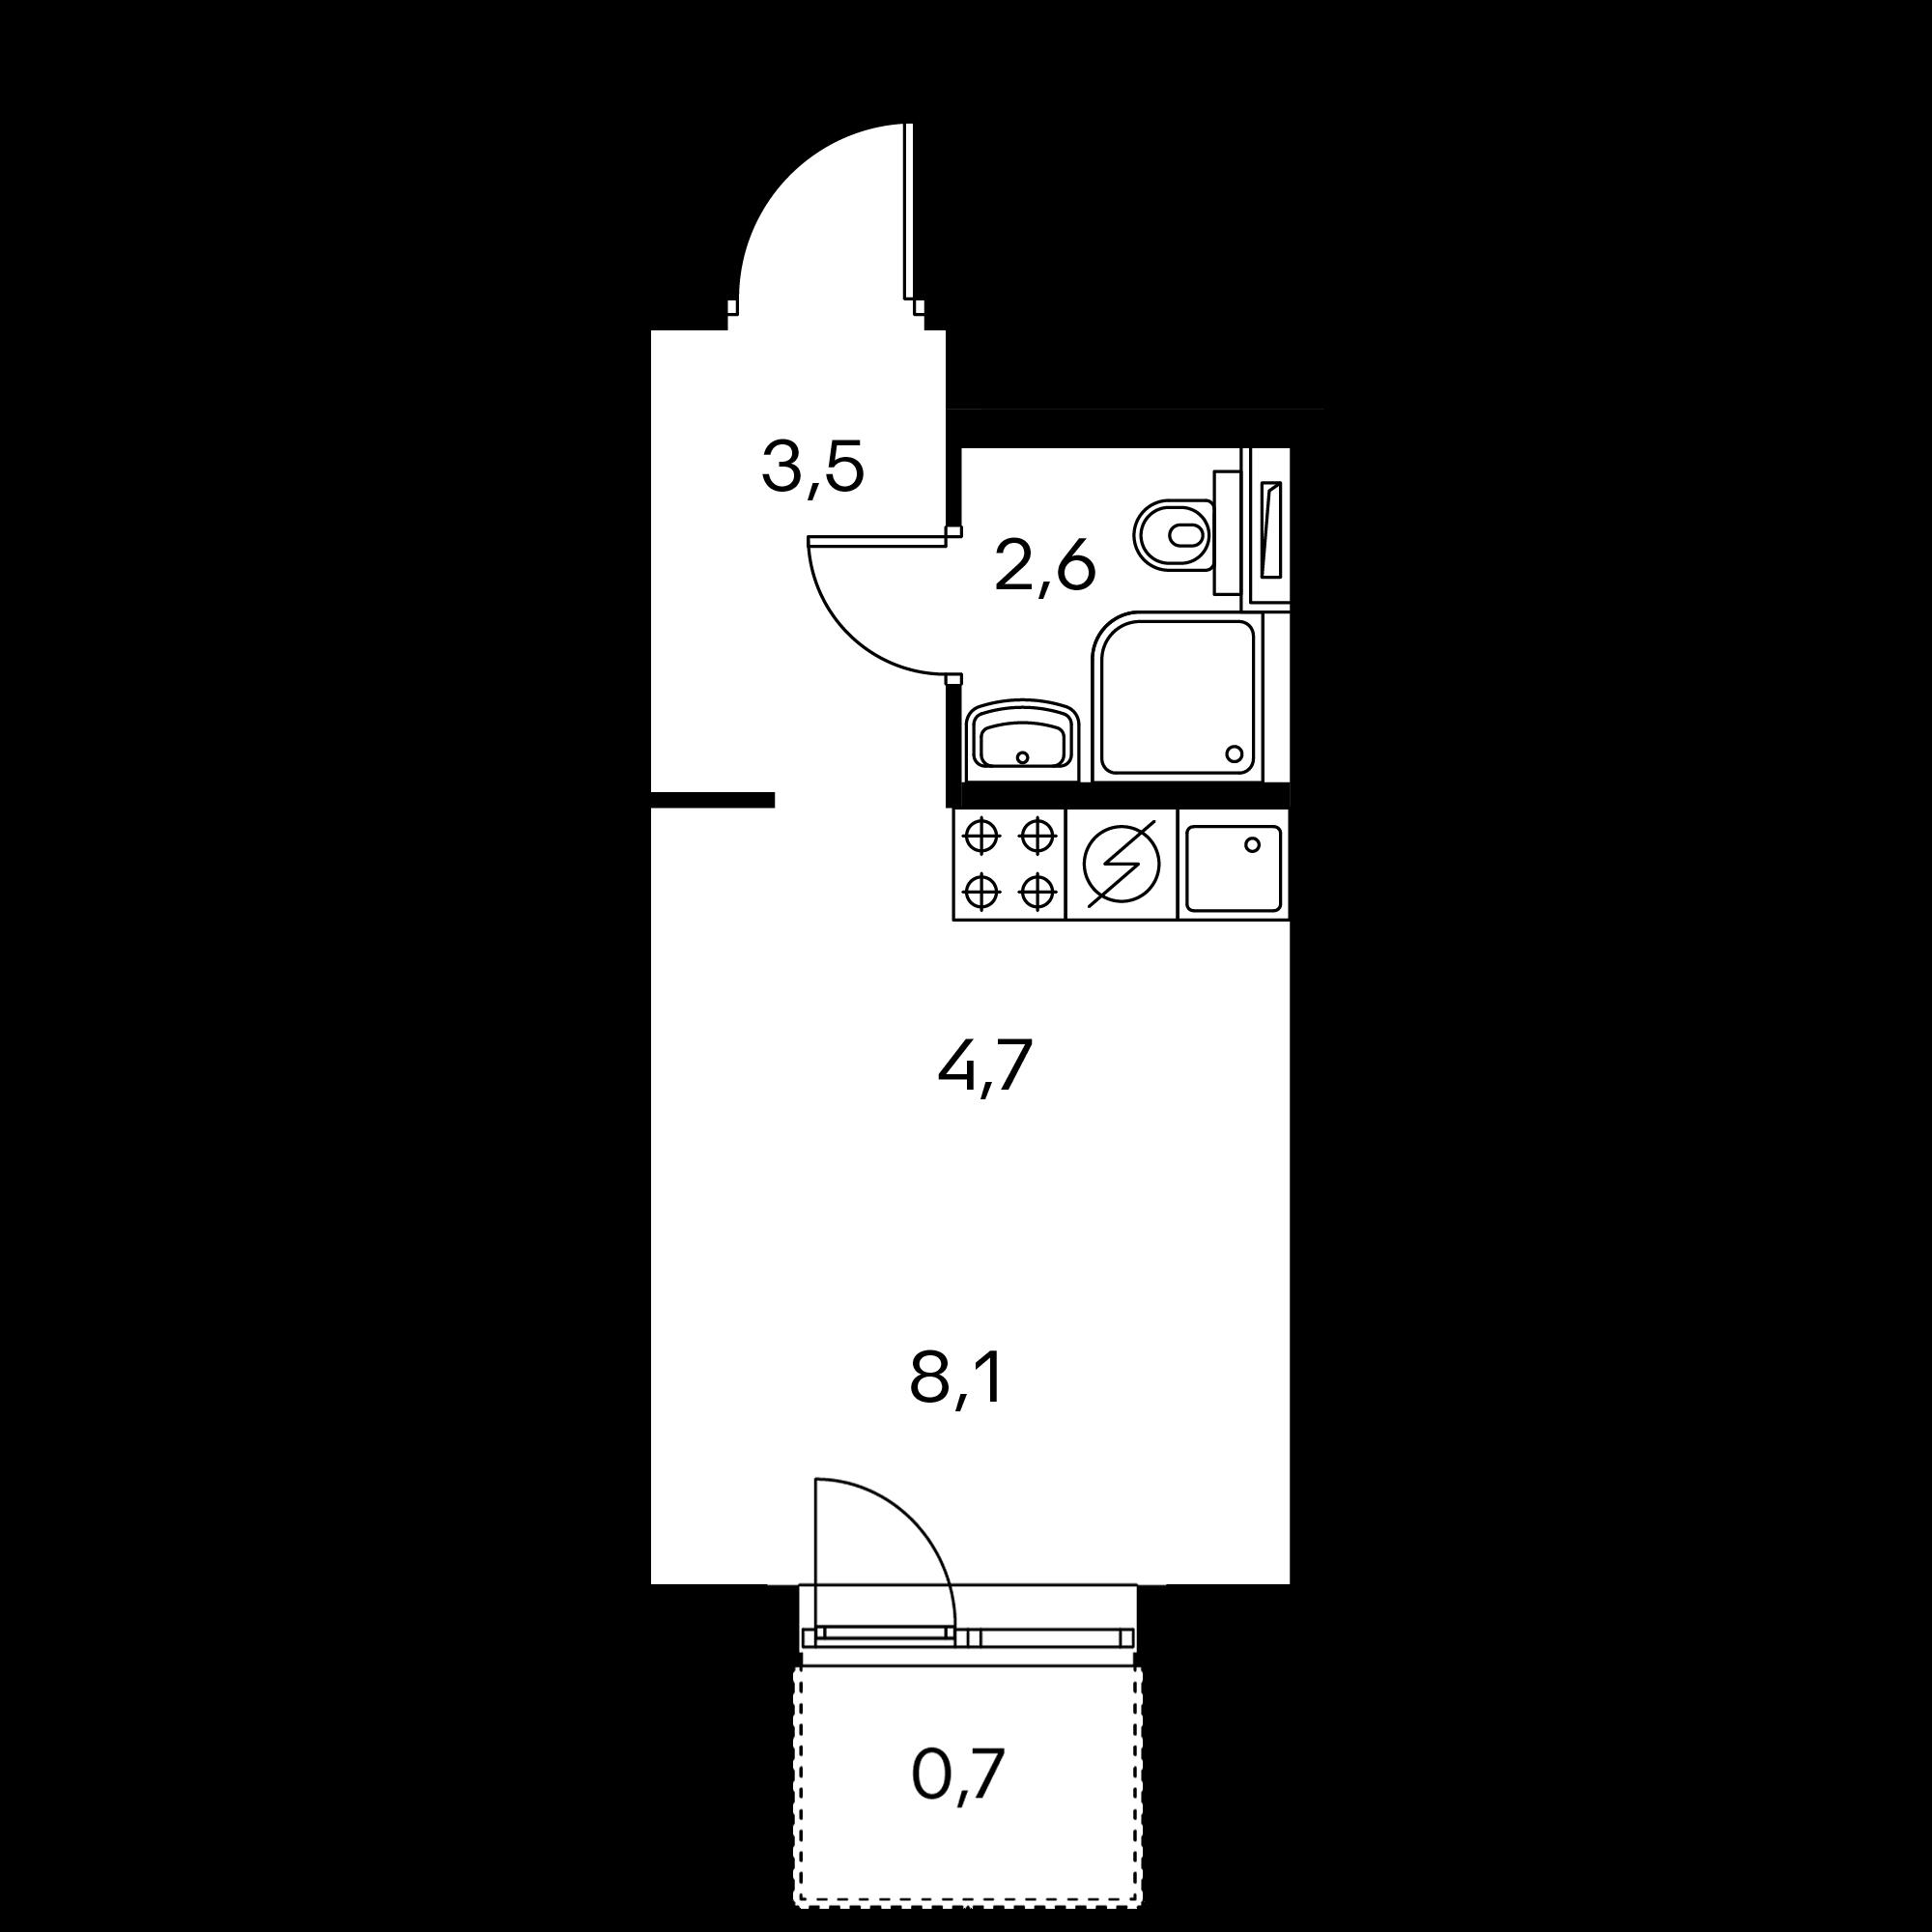 1NS2_3.45-1SZB